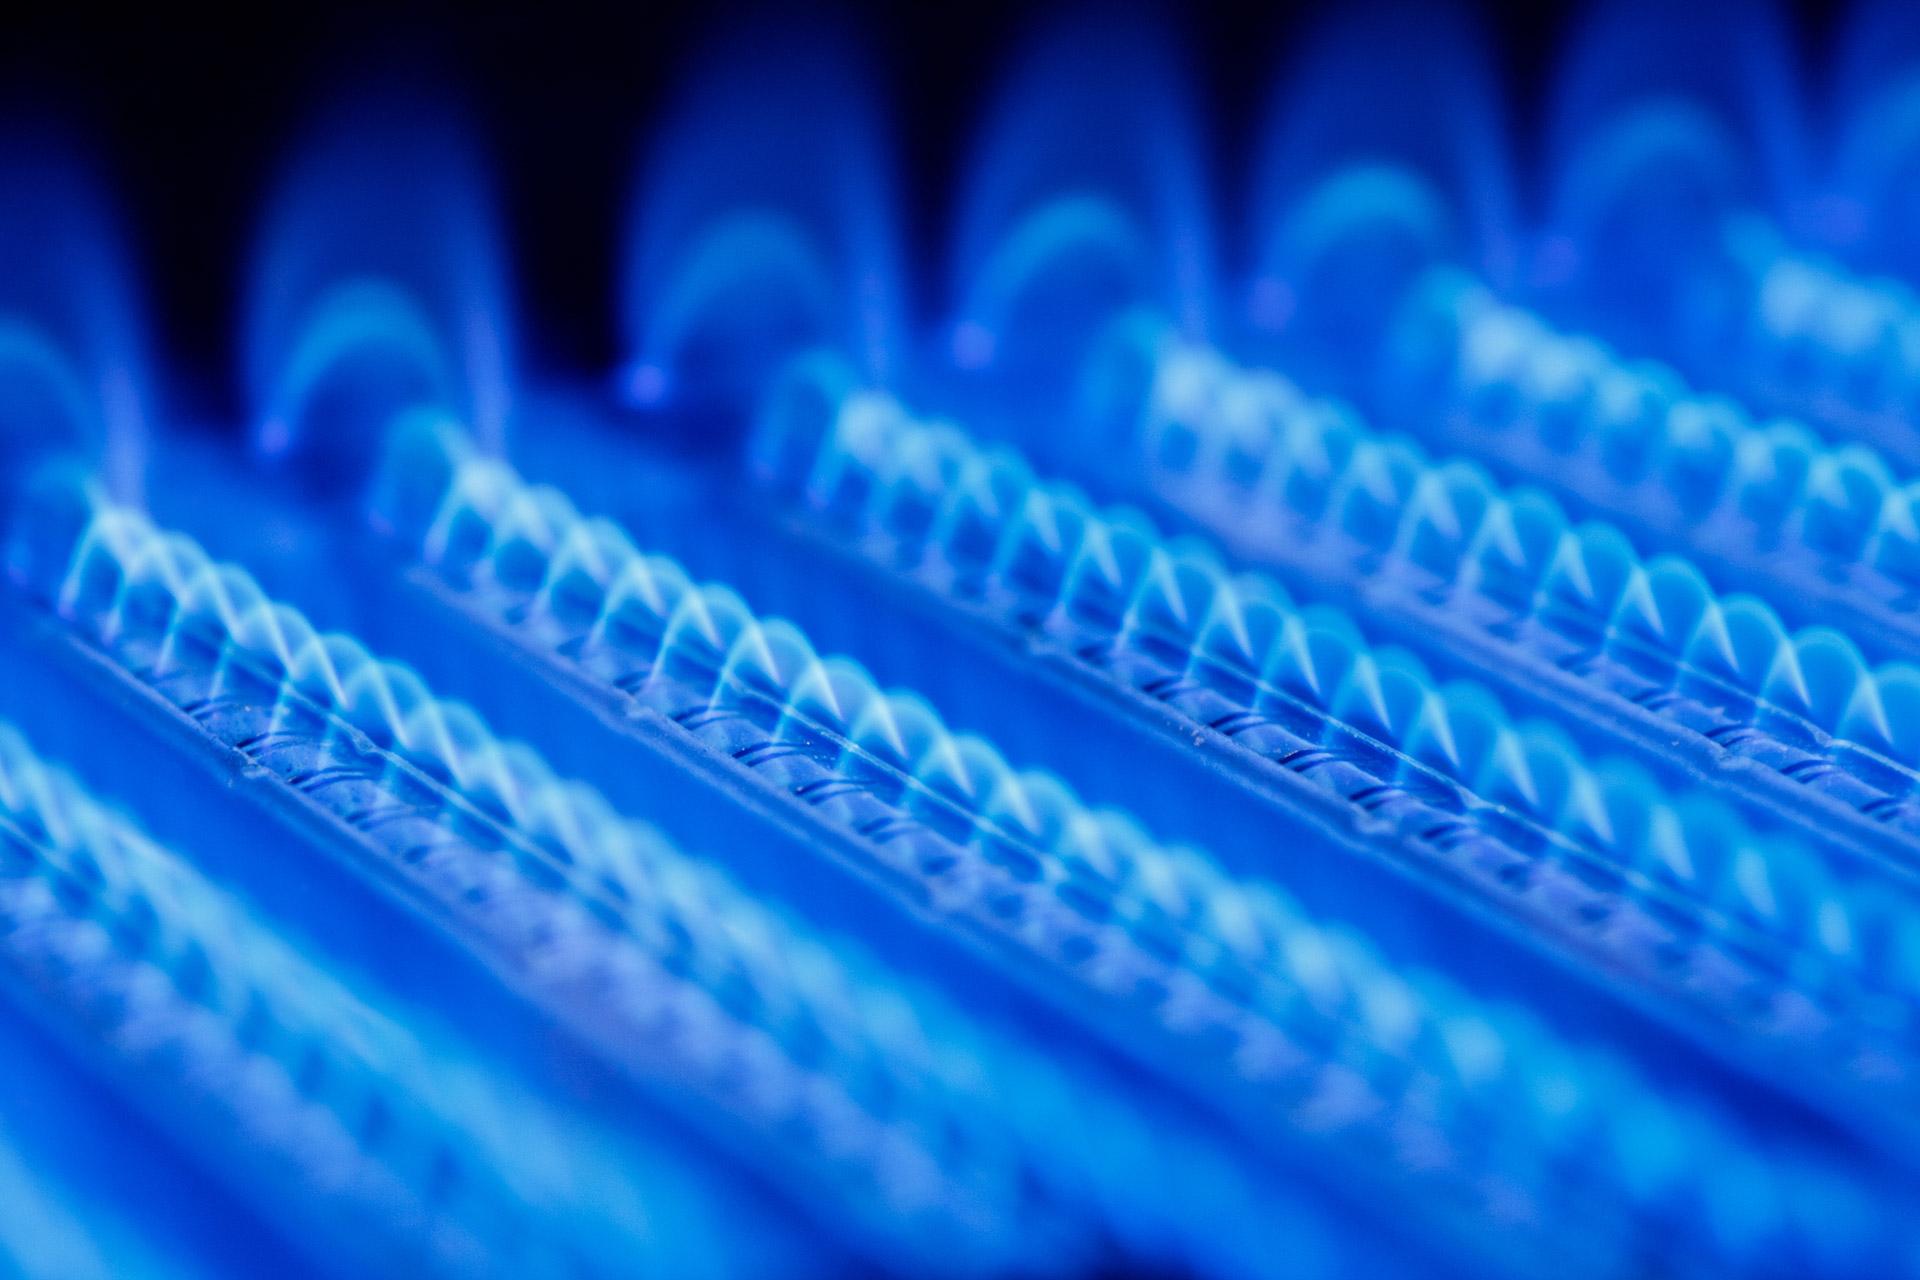 Gas Burners emit a blue flame